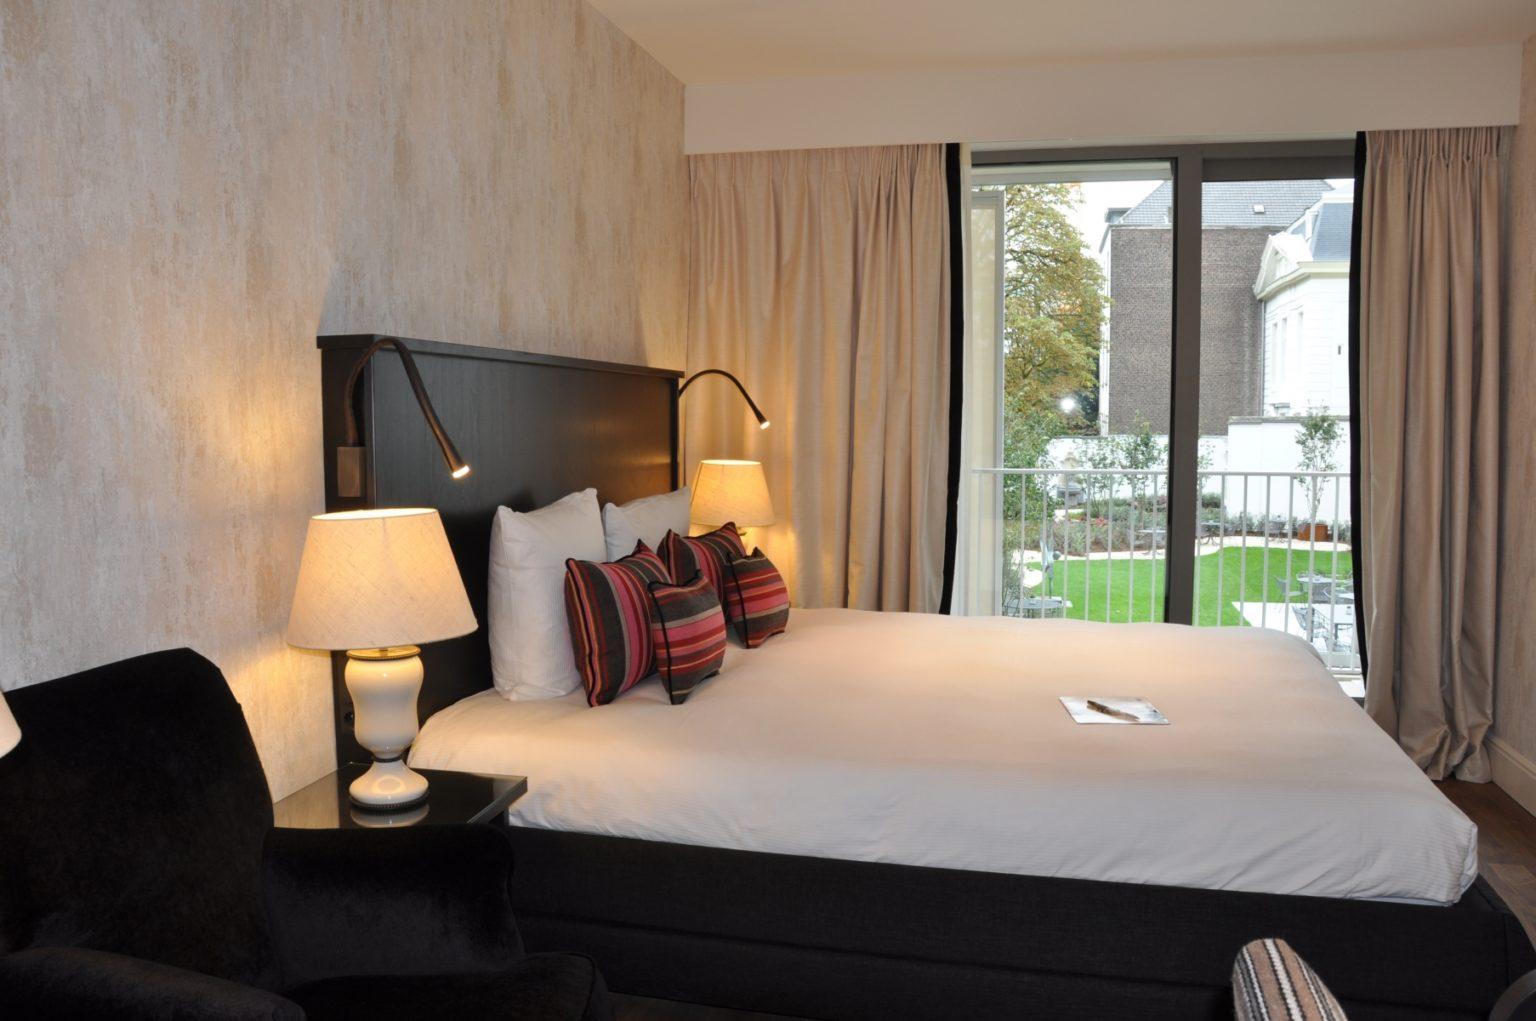 Pillows Grand Boutique Hotel Reylof